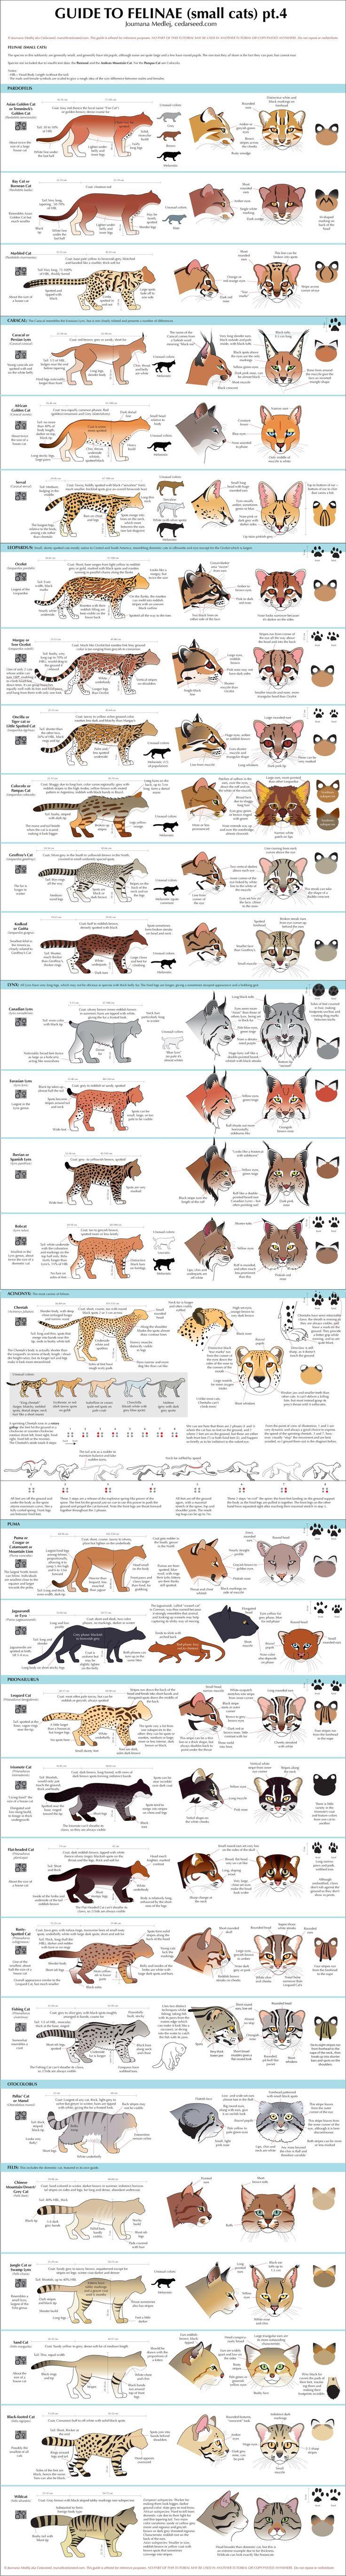 So many types of wild cats around the world! http://www.refugechatsverdun.com/